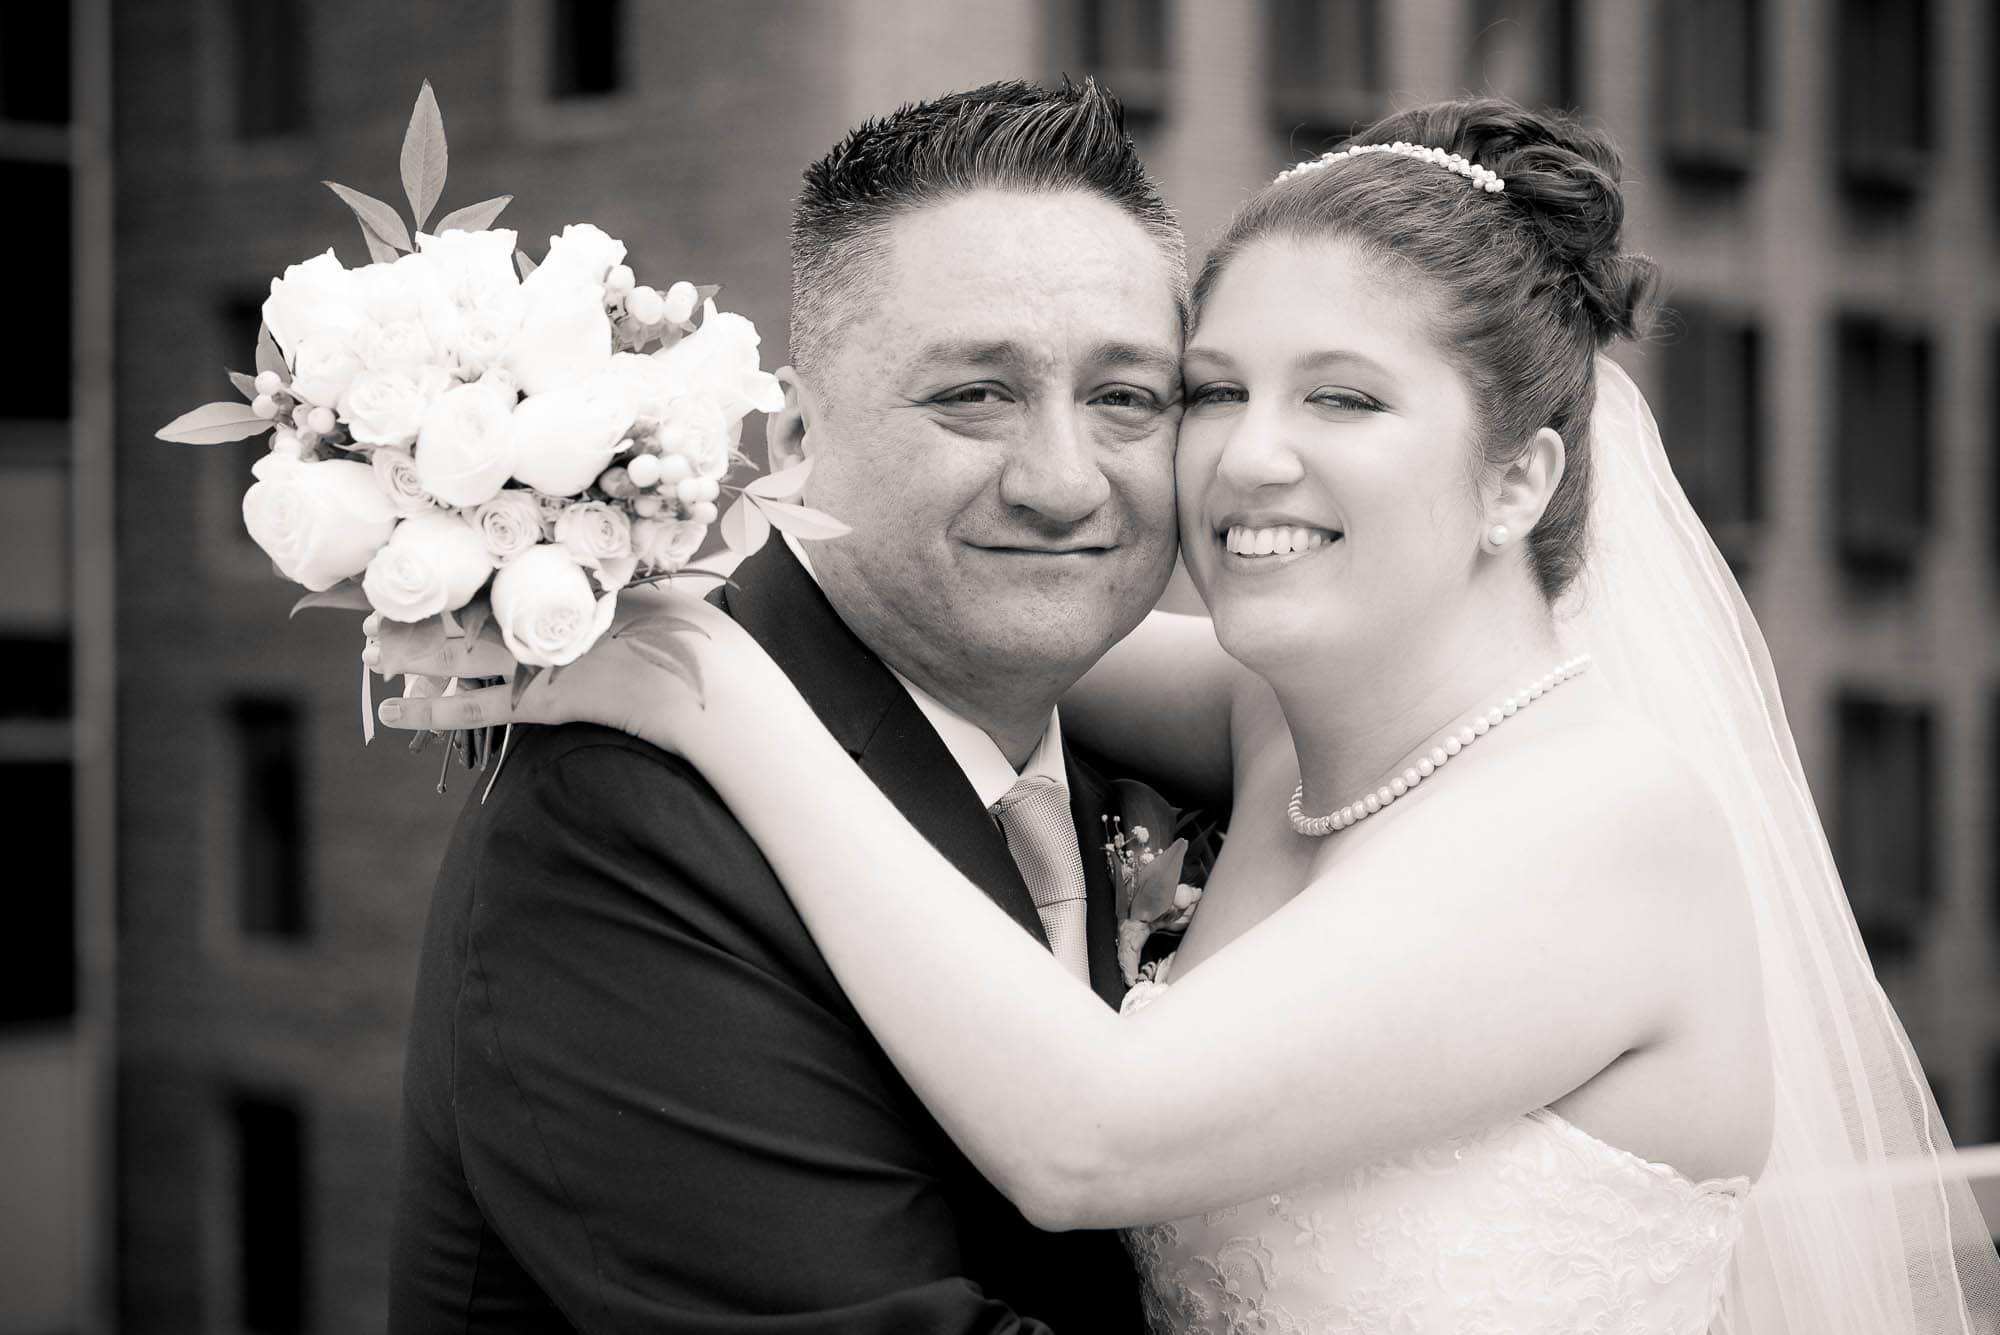 013_Alan_and_Heidi_Wedding_Nicole_Roman